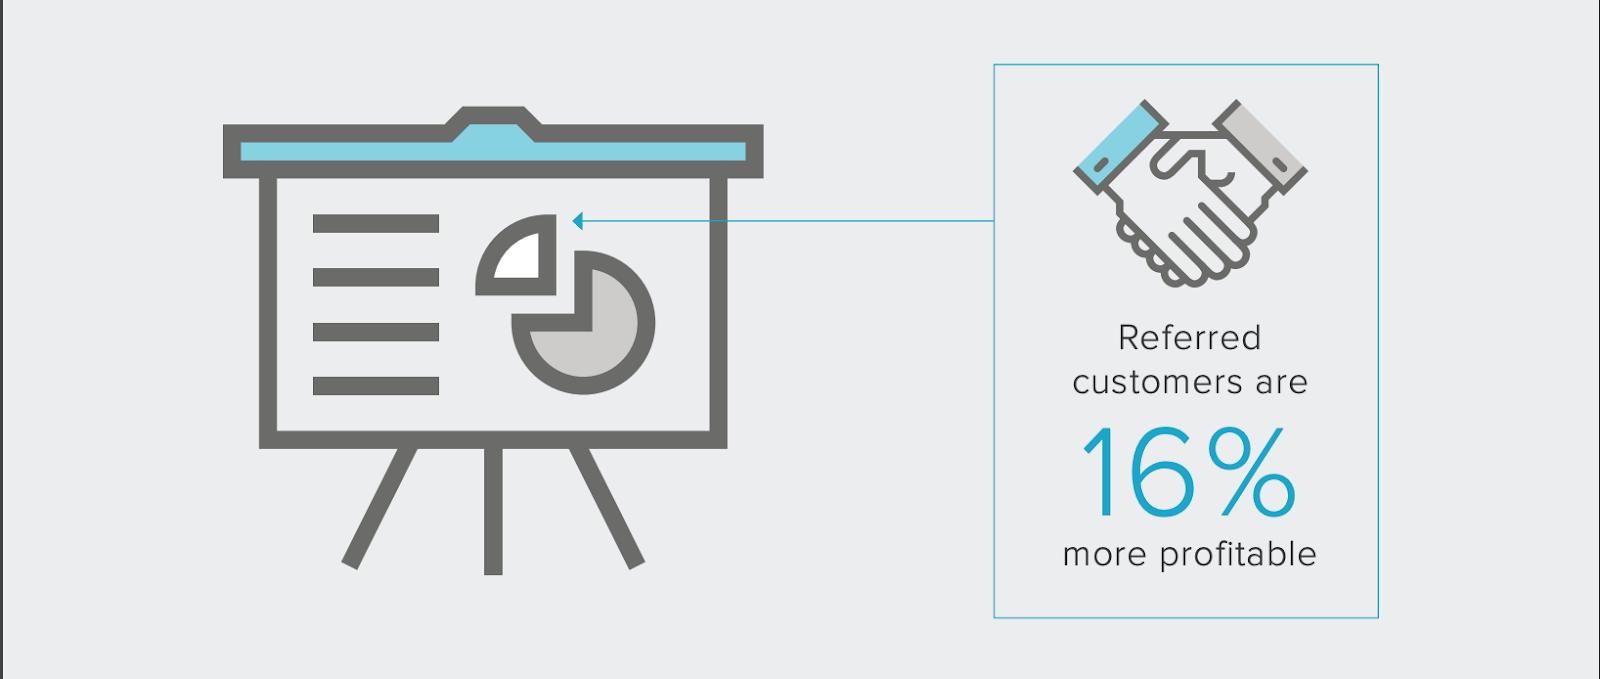 Referral customers are 16% more profitable